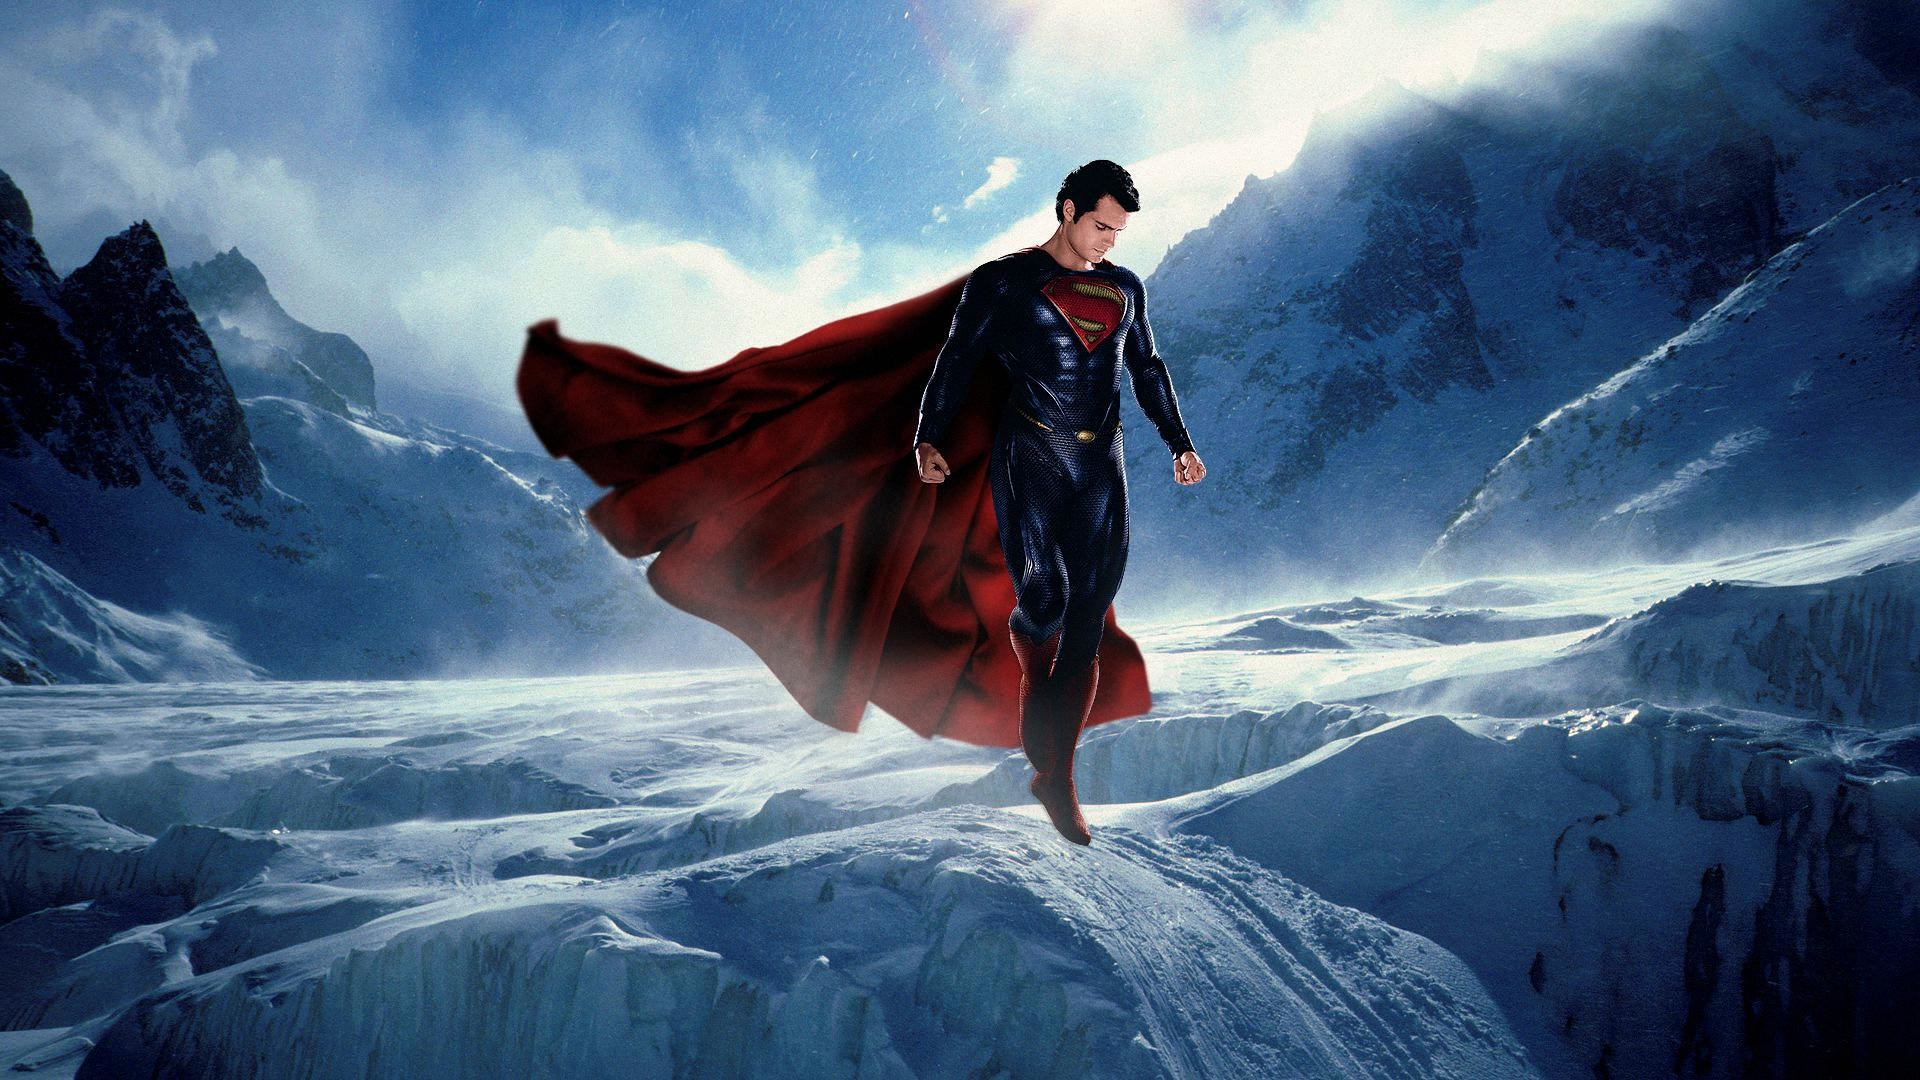 wallpaper.wiki-Superman-return-1080p-wallpaper-PIC-WPE0014520